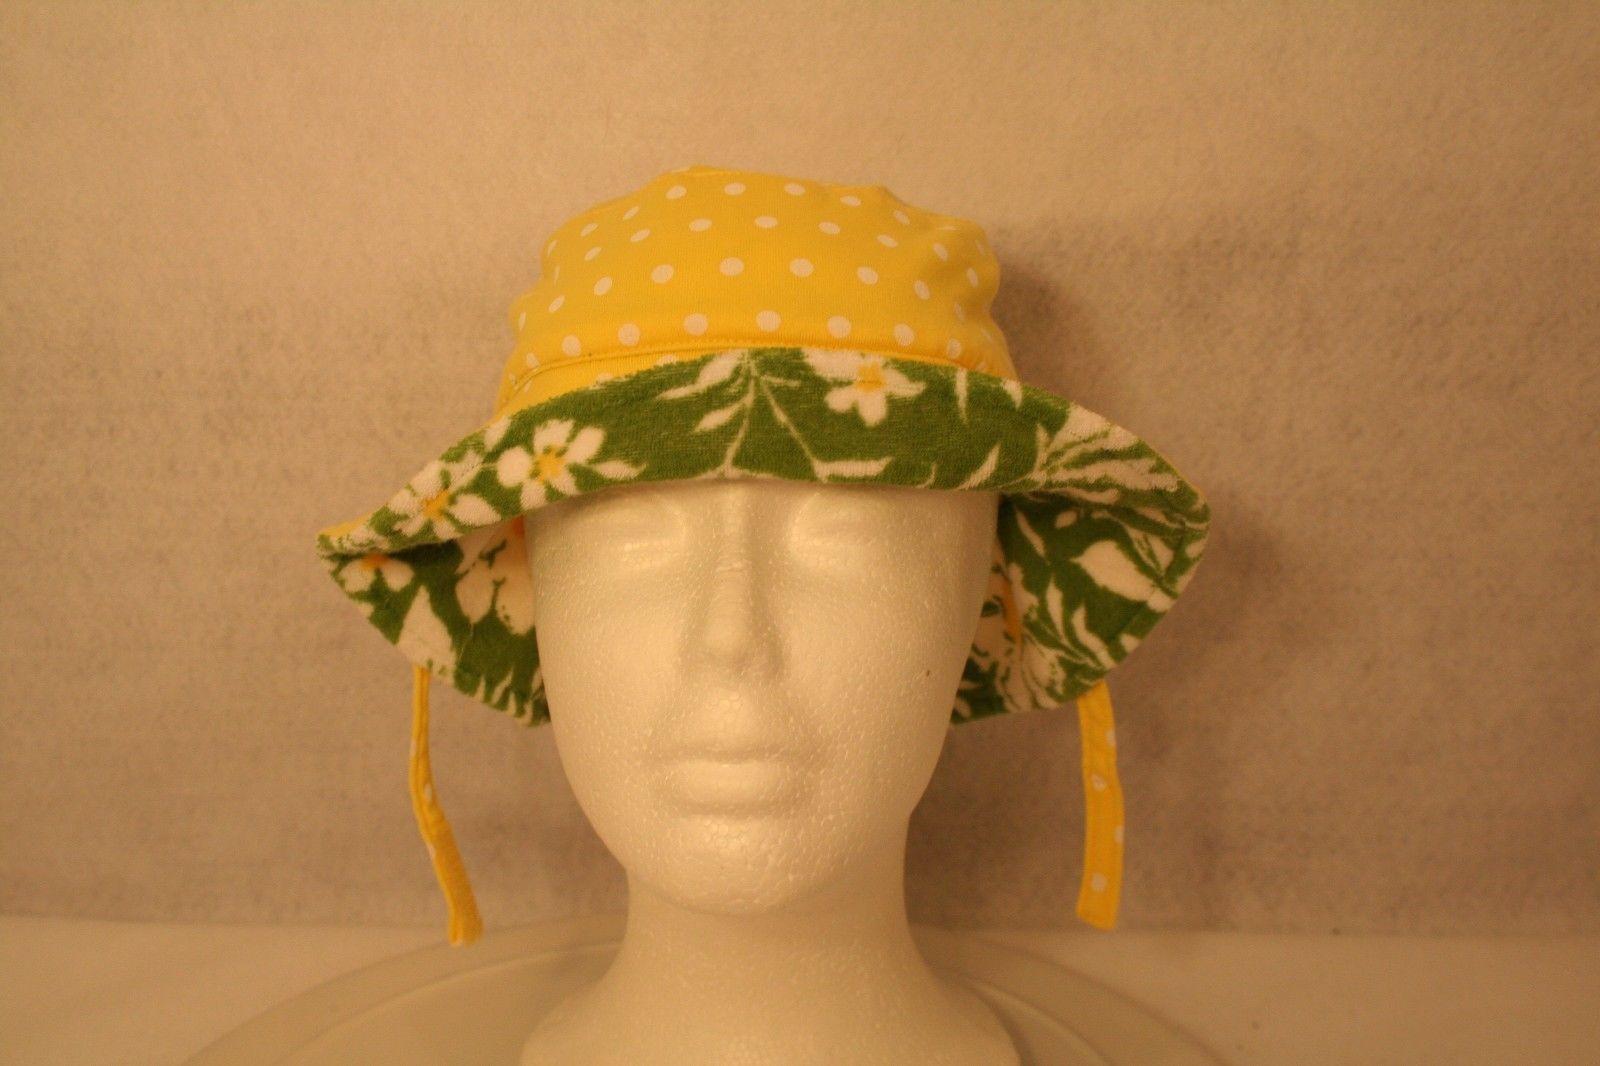 Janie & Jack Child Reversible Sun Hat Green daisy yellow polka dot w/adjust ties image 4